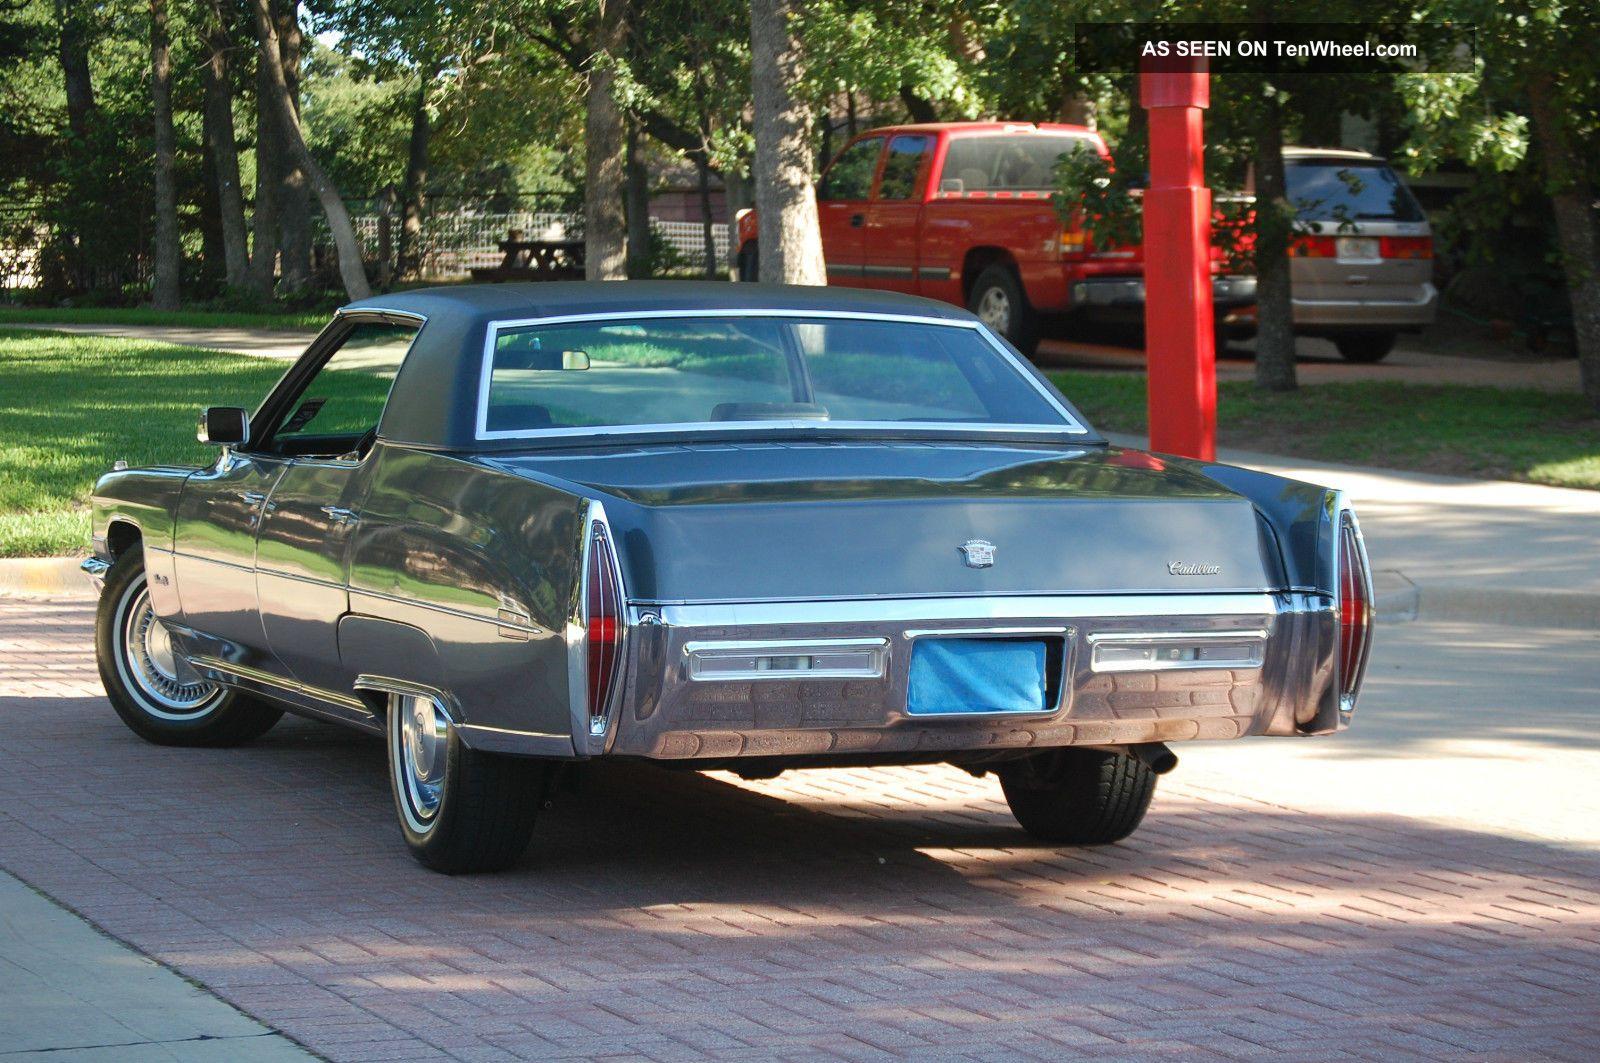 1971 Cadillac Sedan Deville Hardtop DeVille photo